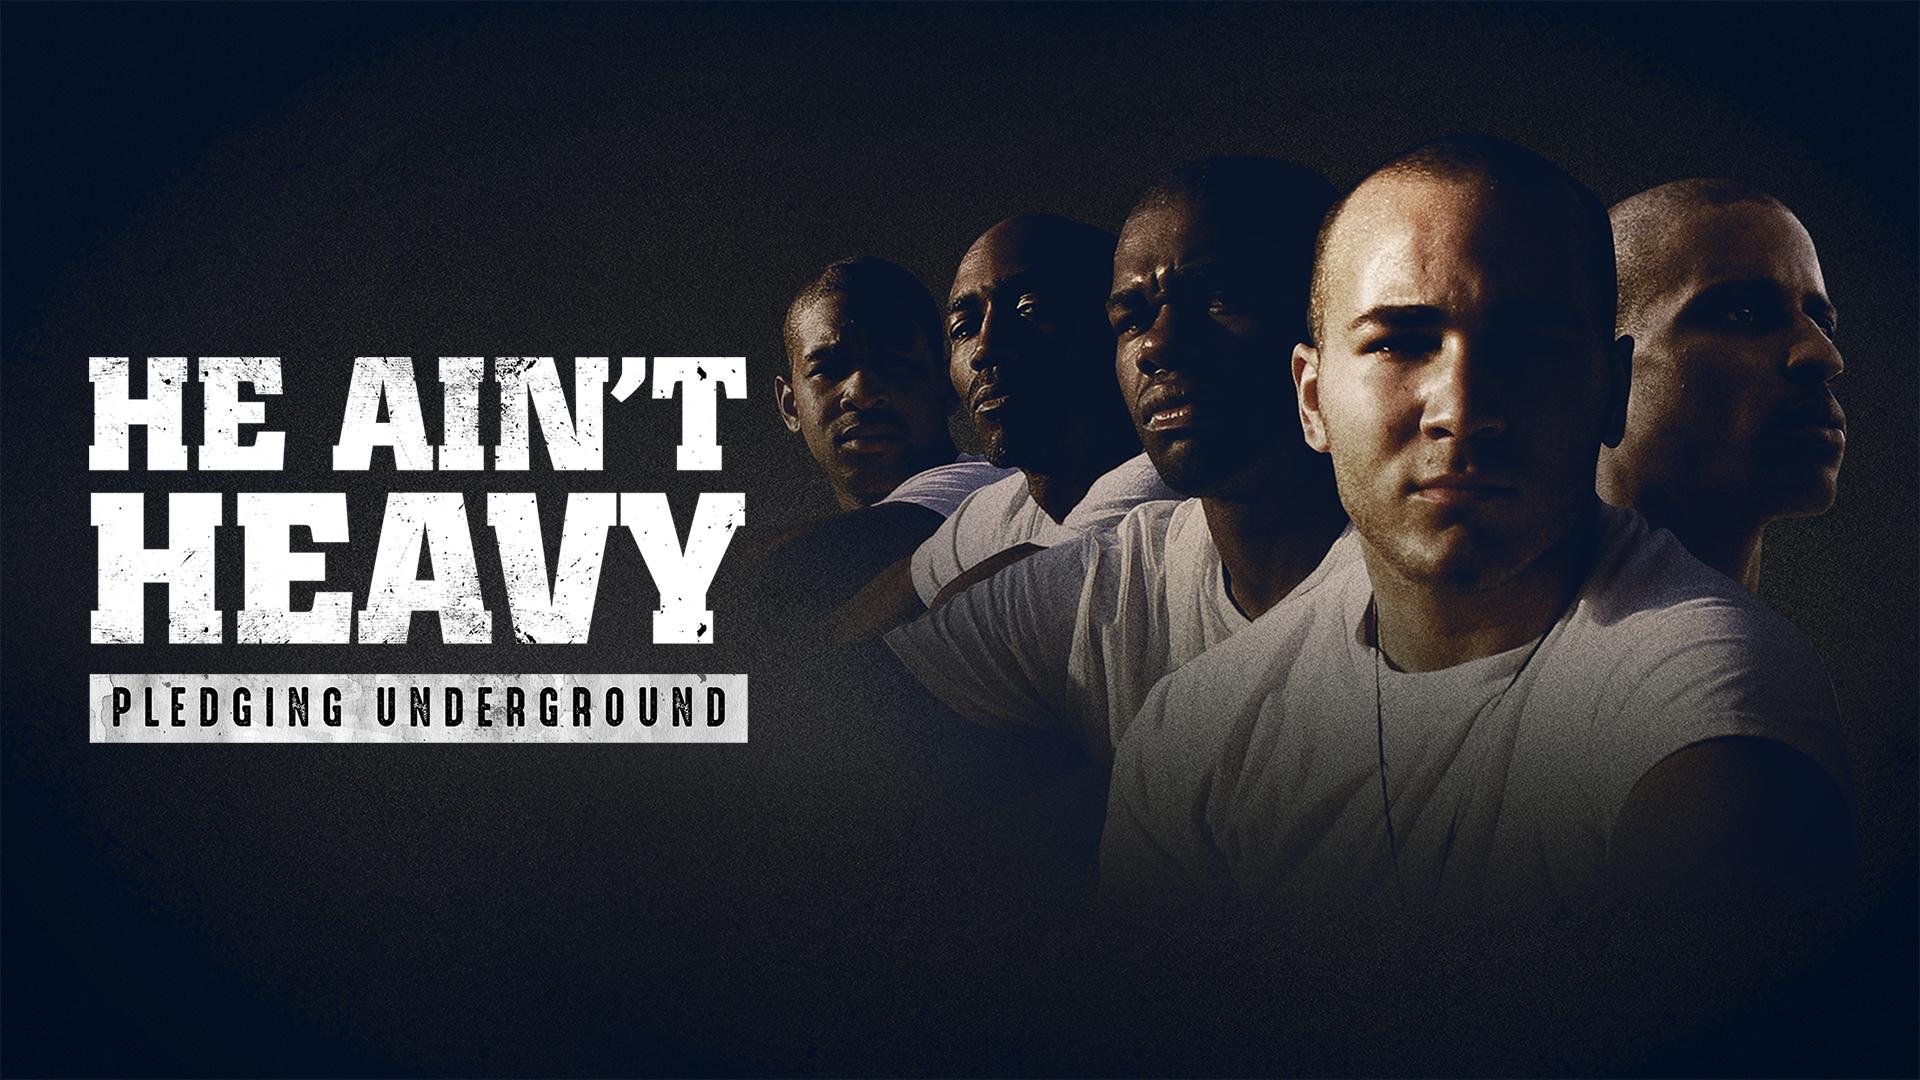 He Ain't Heavy...Pledging Underground - Drama category image